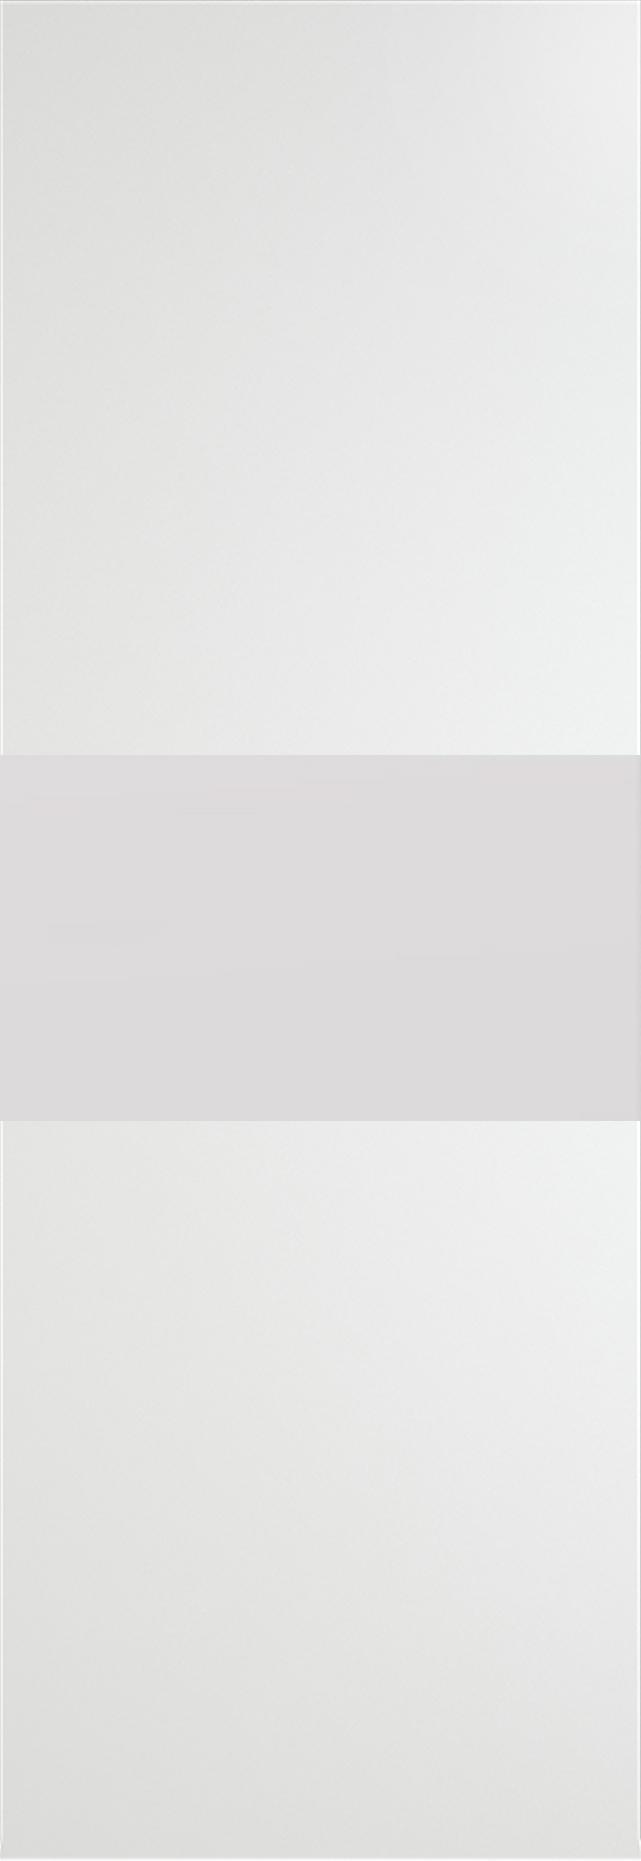 Tivoli Е-4 Invisible цвет - Белая эмаль Без стекла (ДГ)